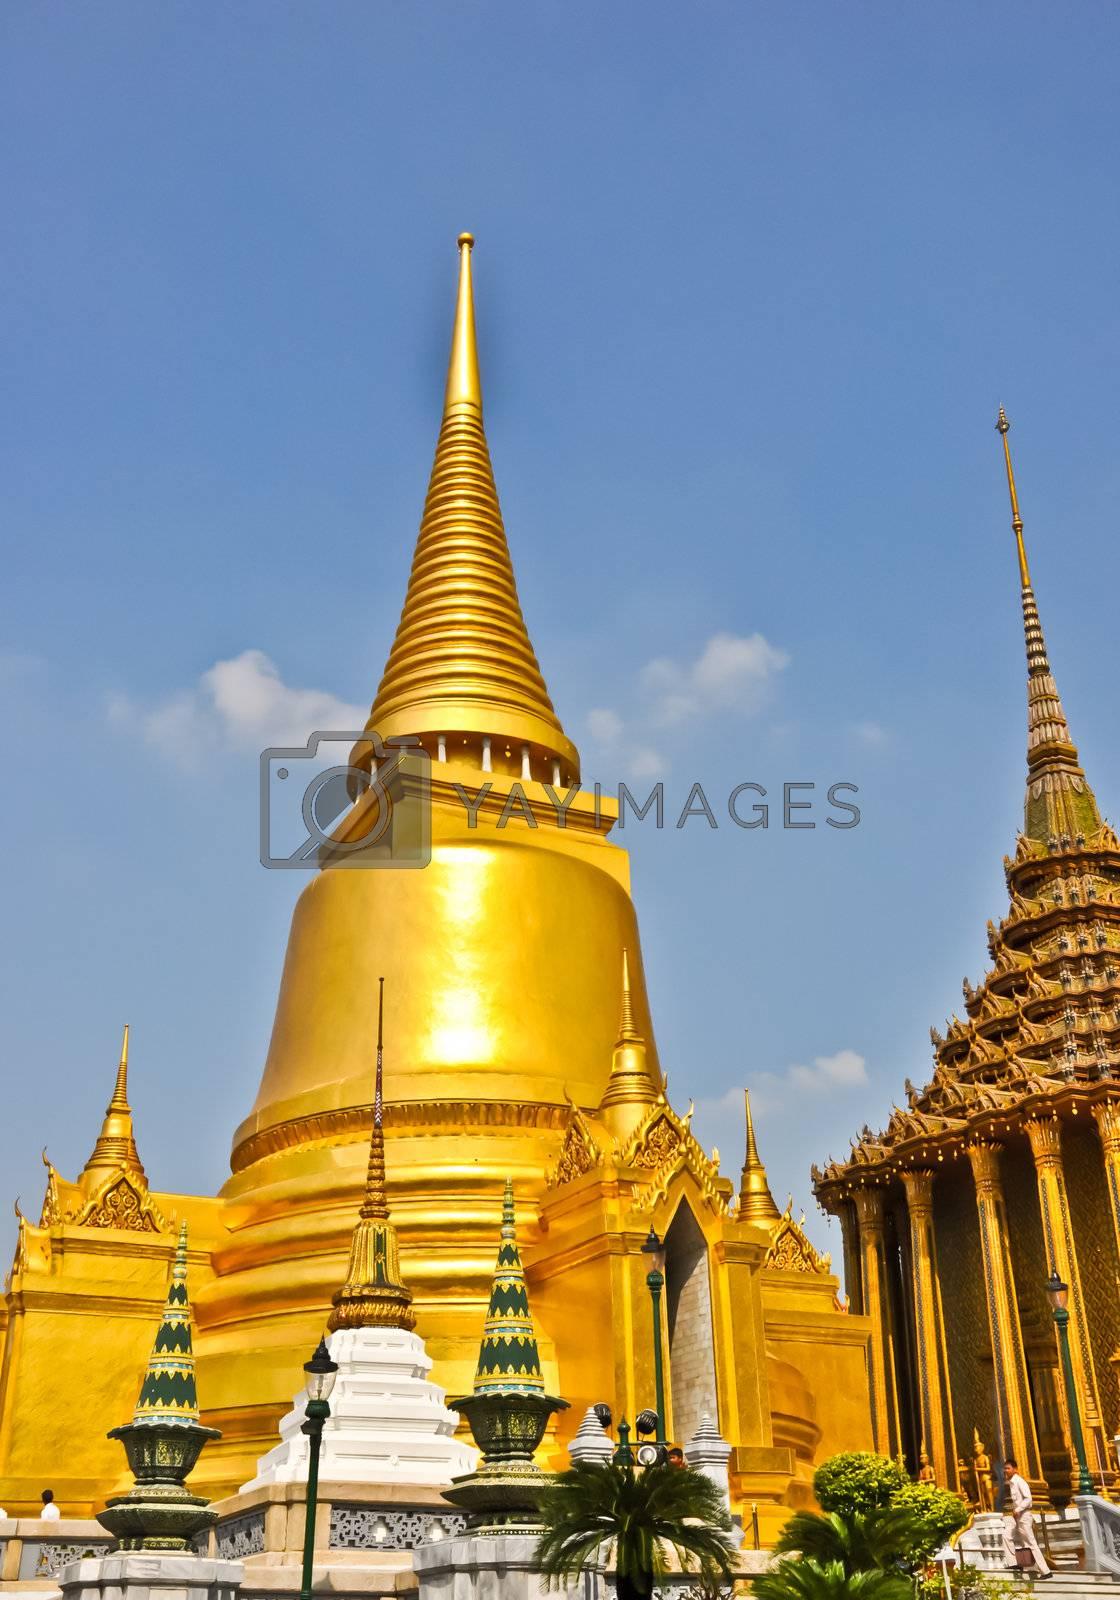 The fantastic Temple of Emerald Buddha